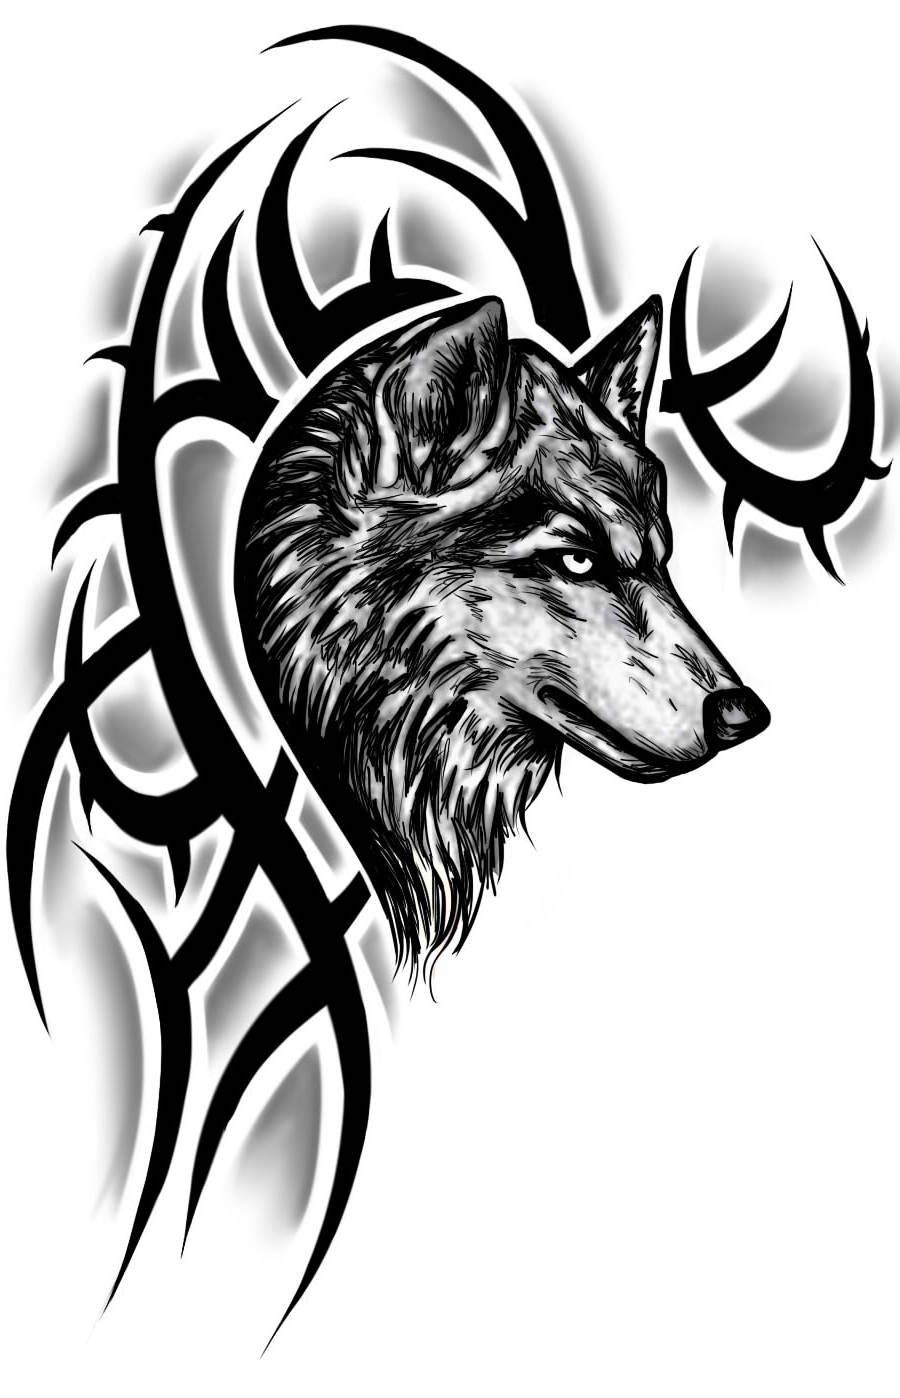 wolf tattoo images designs. Black Bedroom Furniture Sets. Home Design Ideas